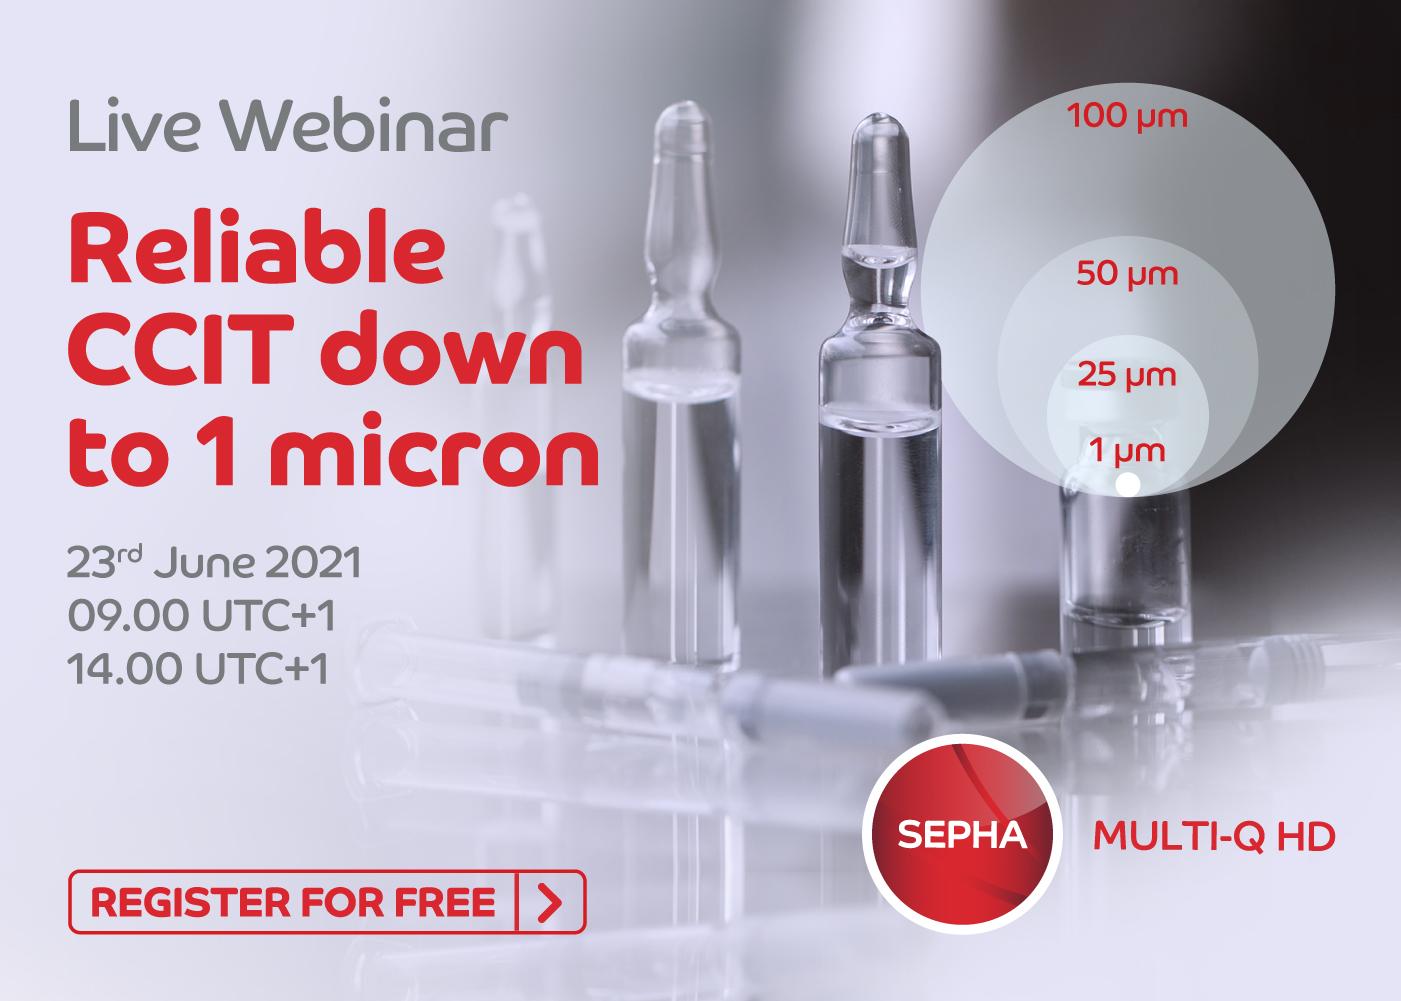 1 Micron CCIT SEPHA MULTI-Q HD